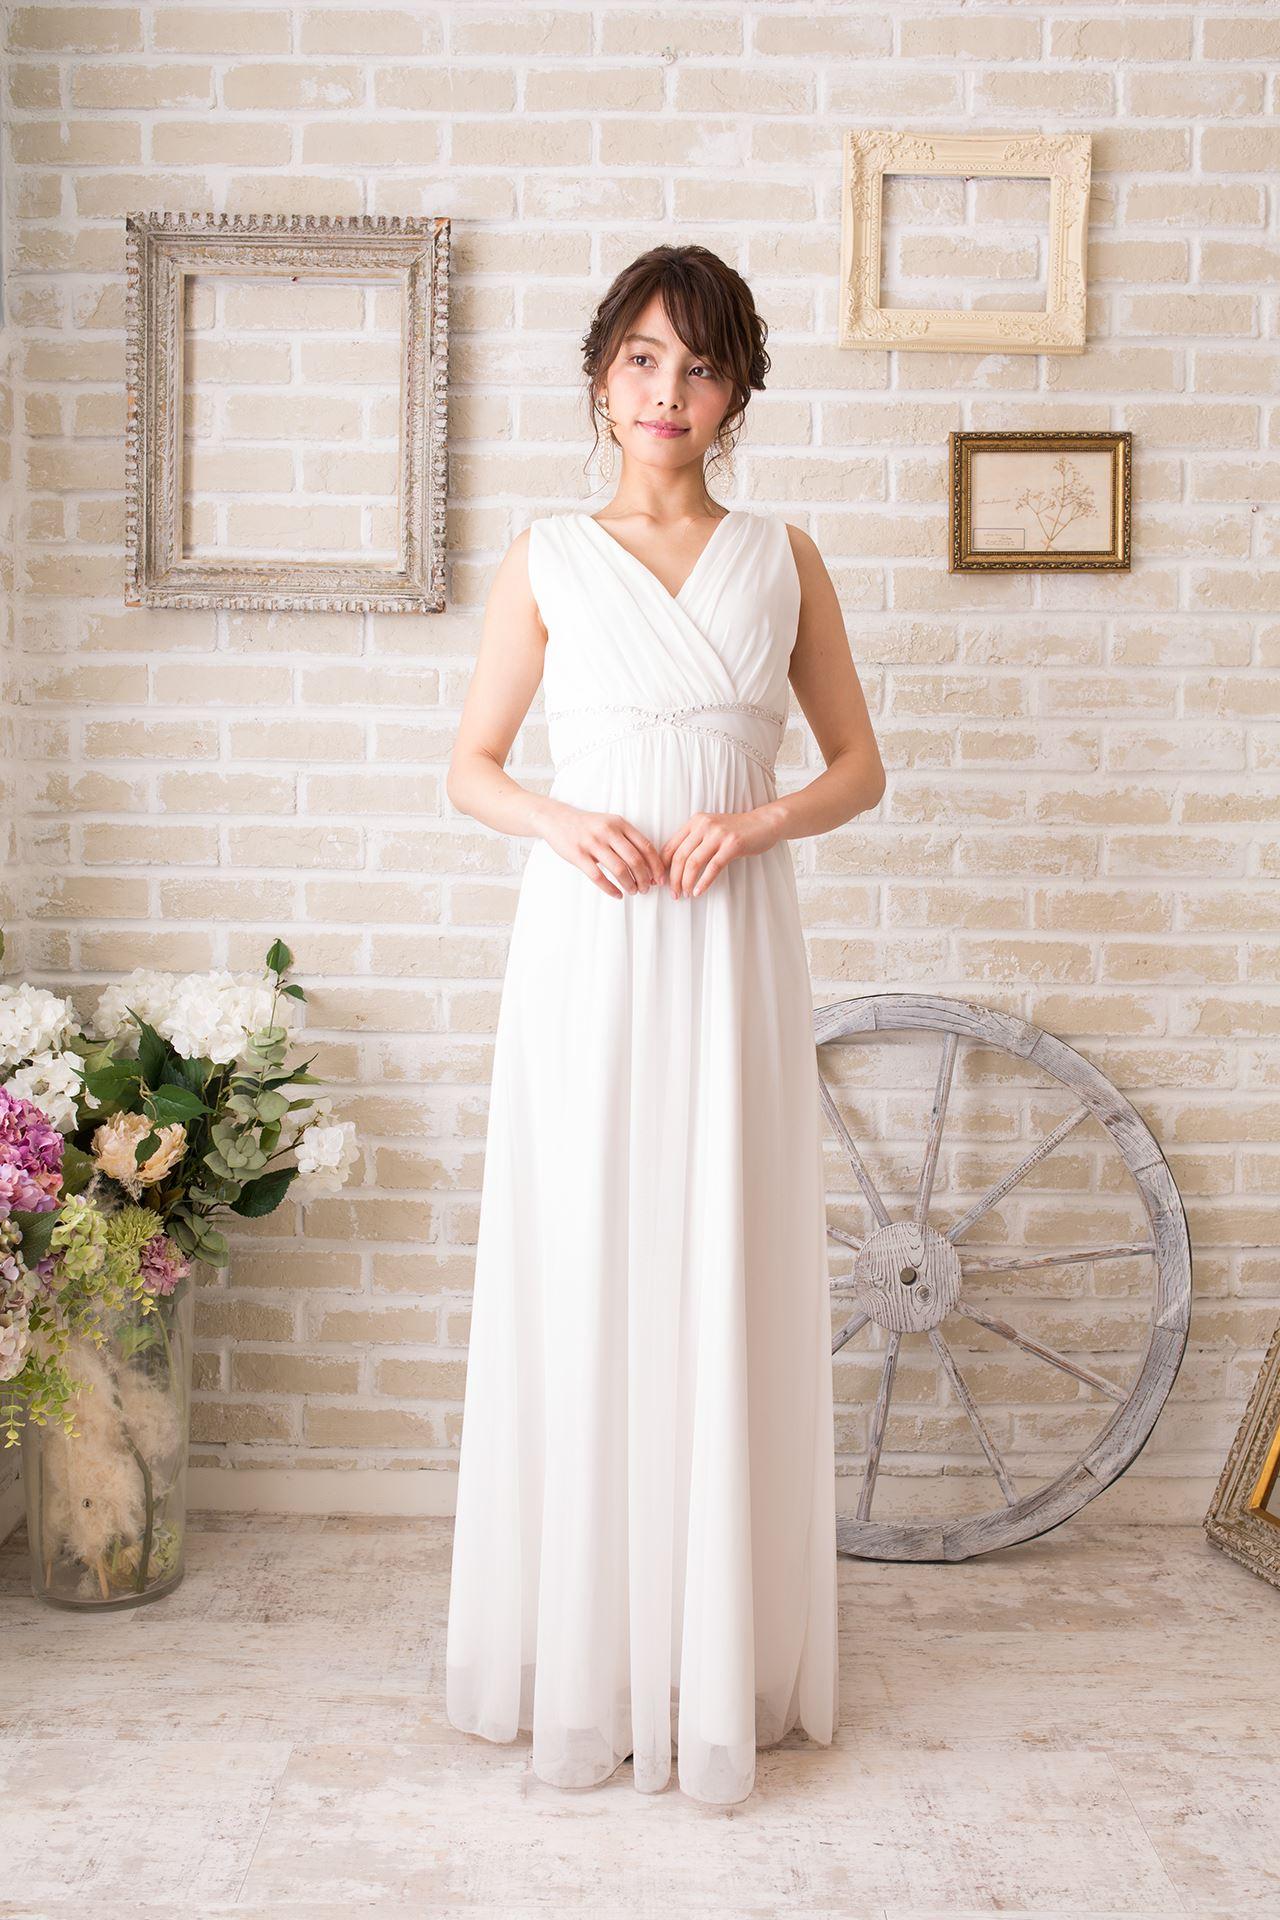 yk_nr_dress_406